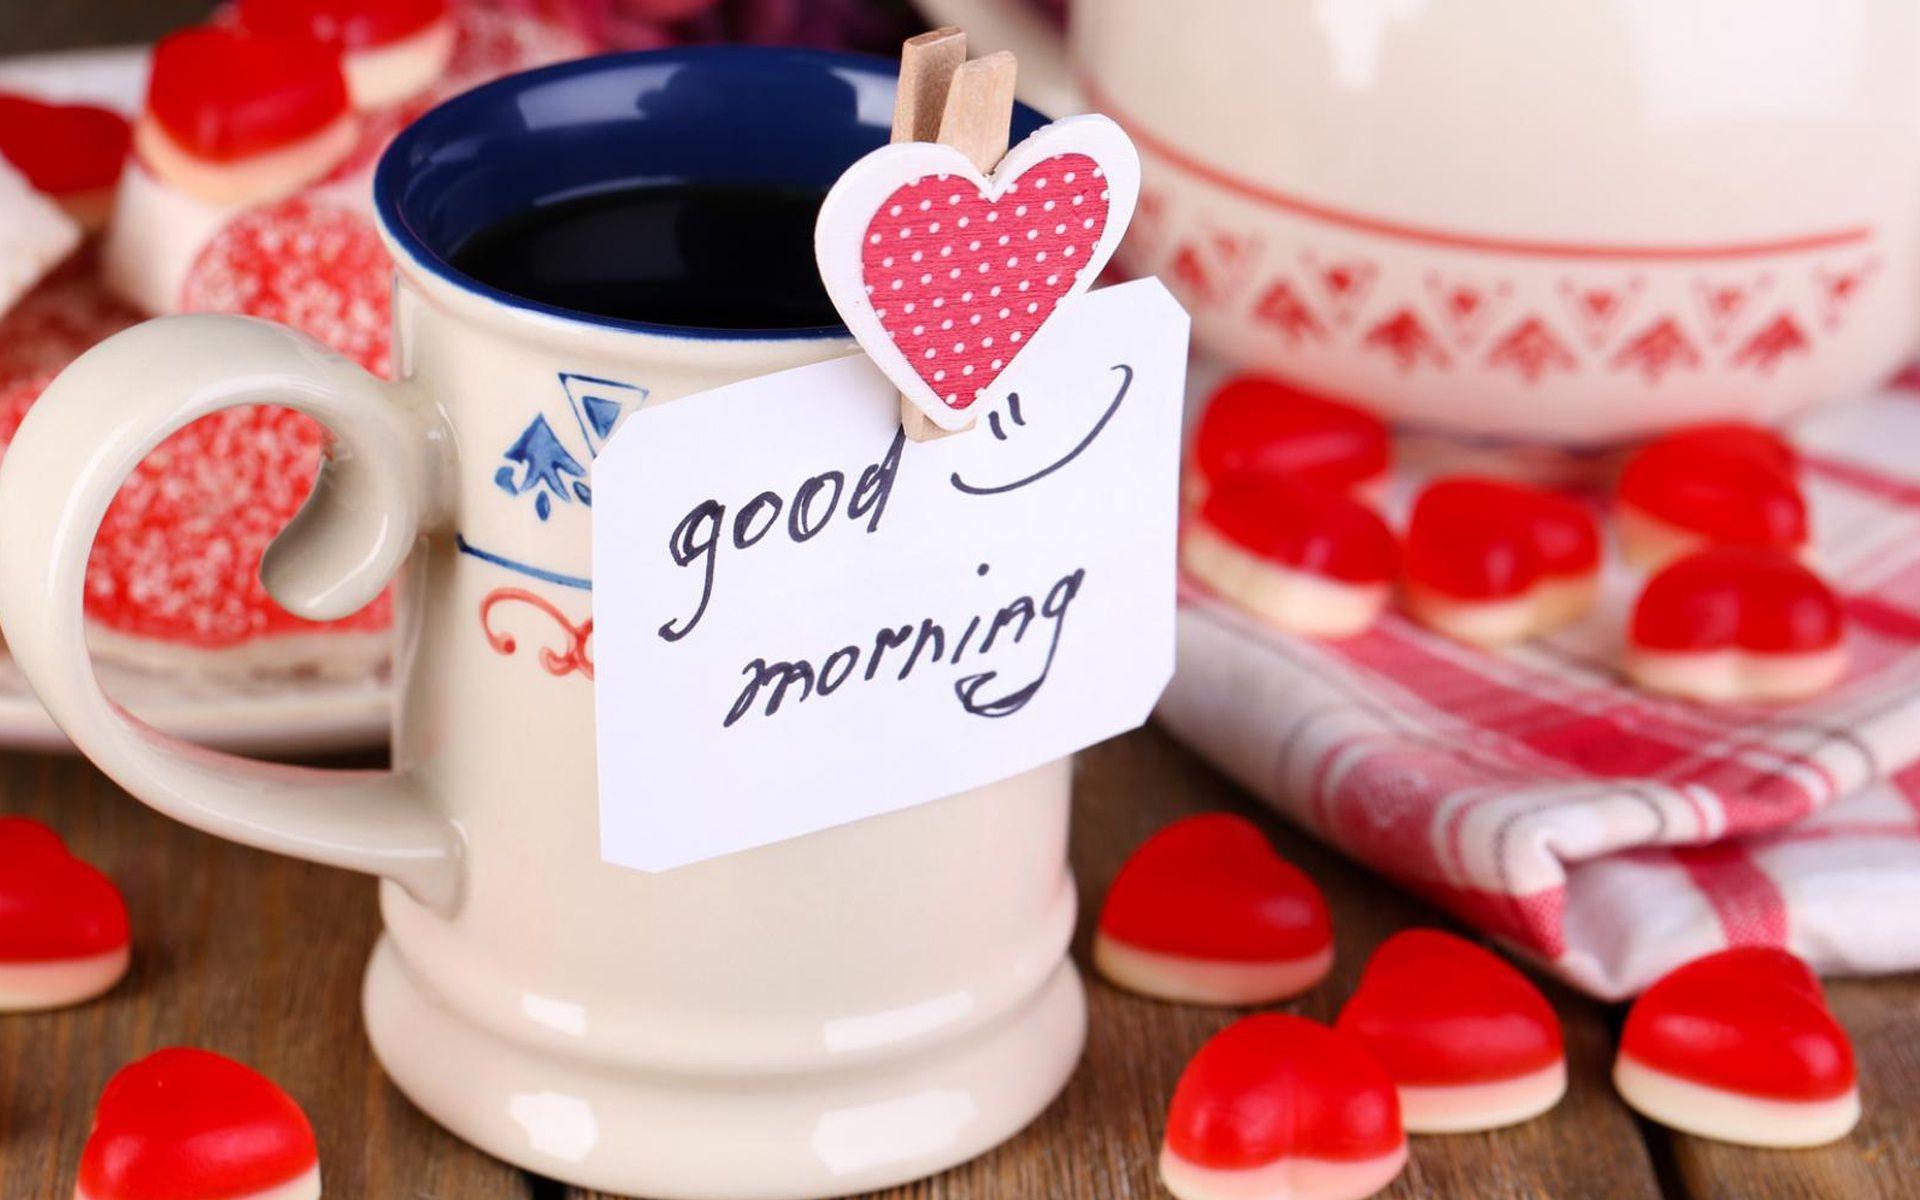 Wallpaper download good morning - Good Morning Wallpapers